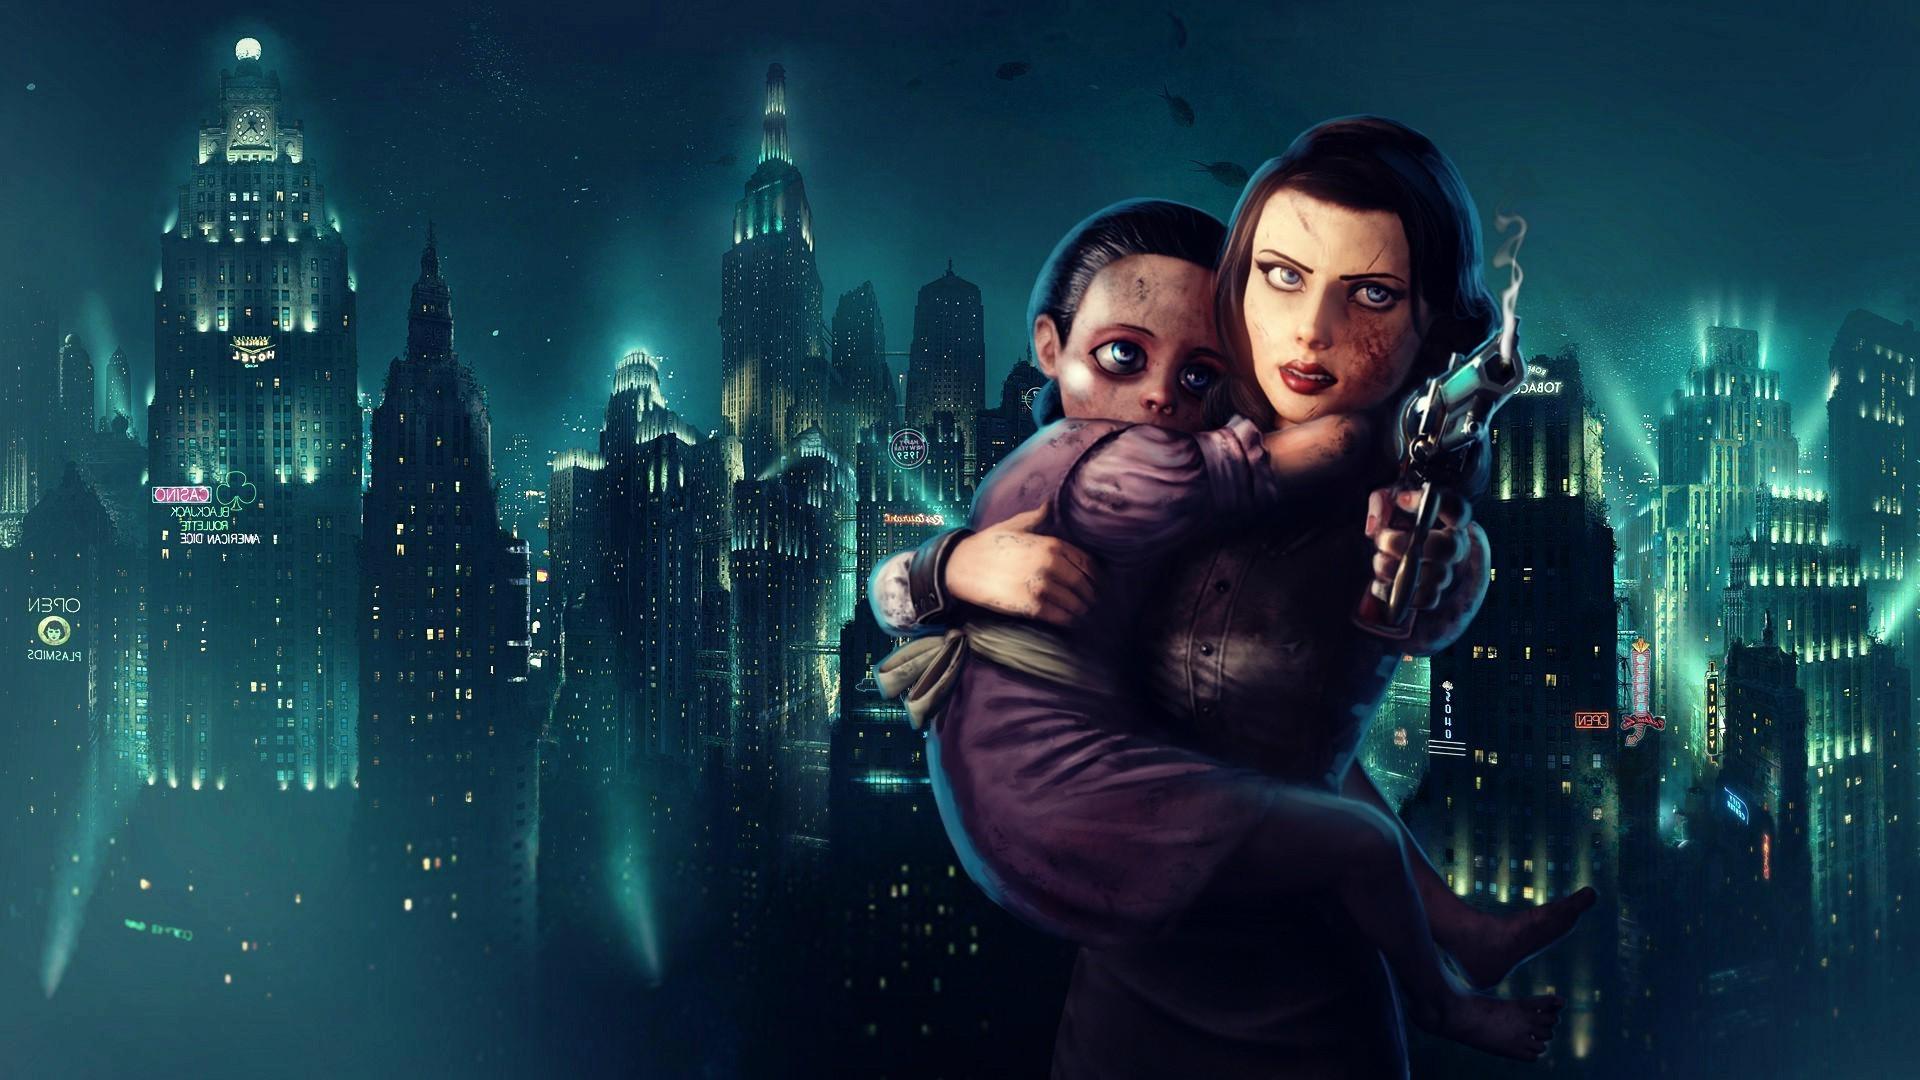 BioShock, BioShock Infinite, Rapture, Little Sister, Video Games, Elizabeth  (BioShock) Wallpapers HD / Desktop and Mobile Backgrounds